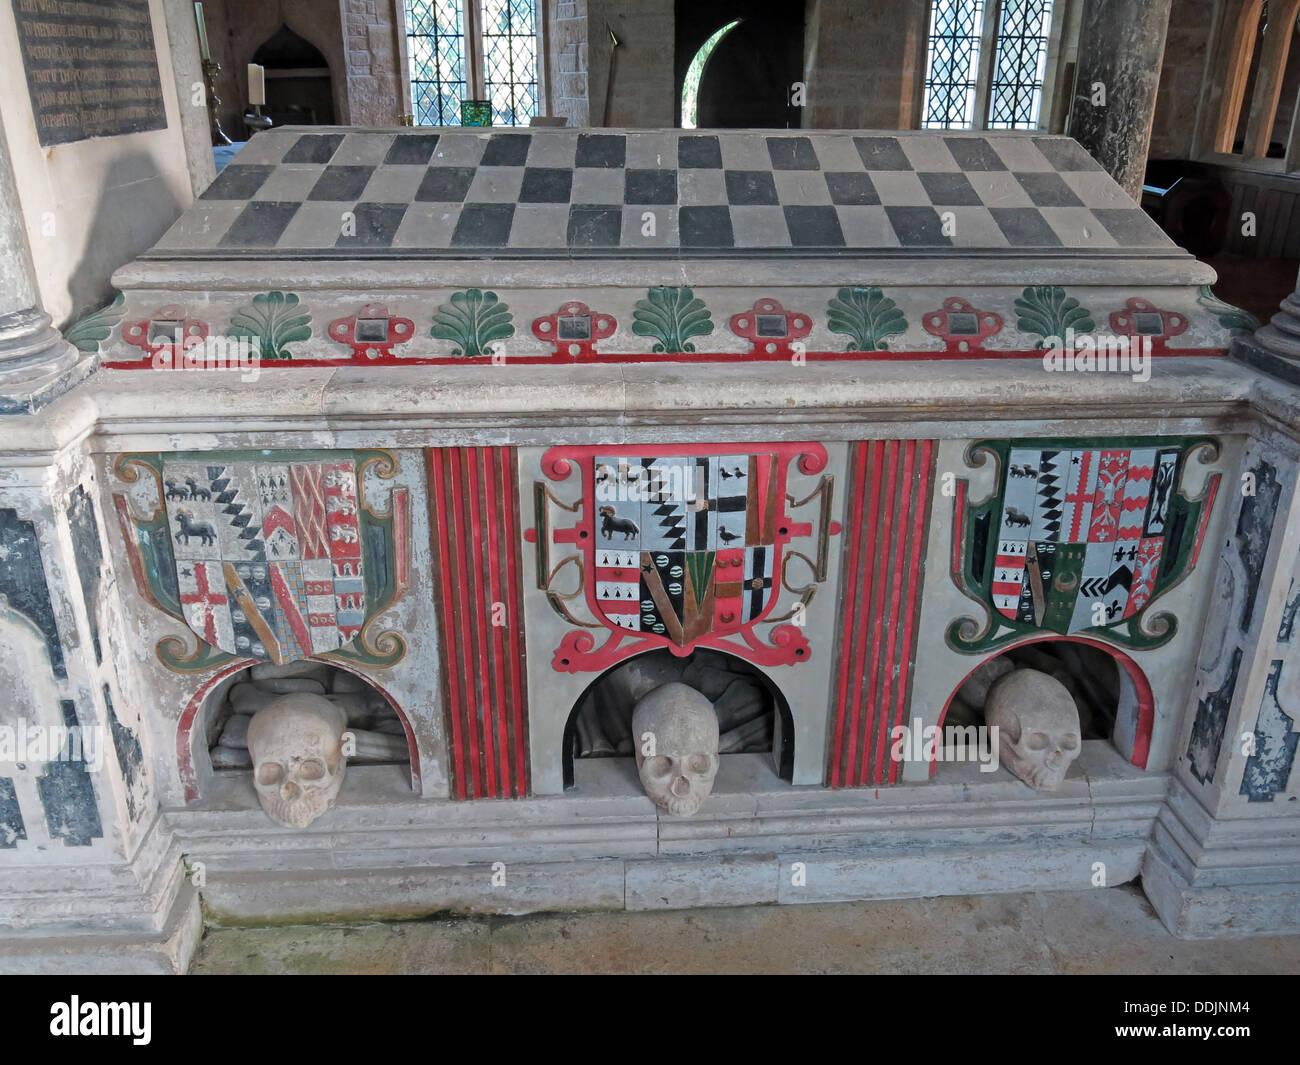 Tomb of John Sydenham, Brympton d'Evercy - Stock Image